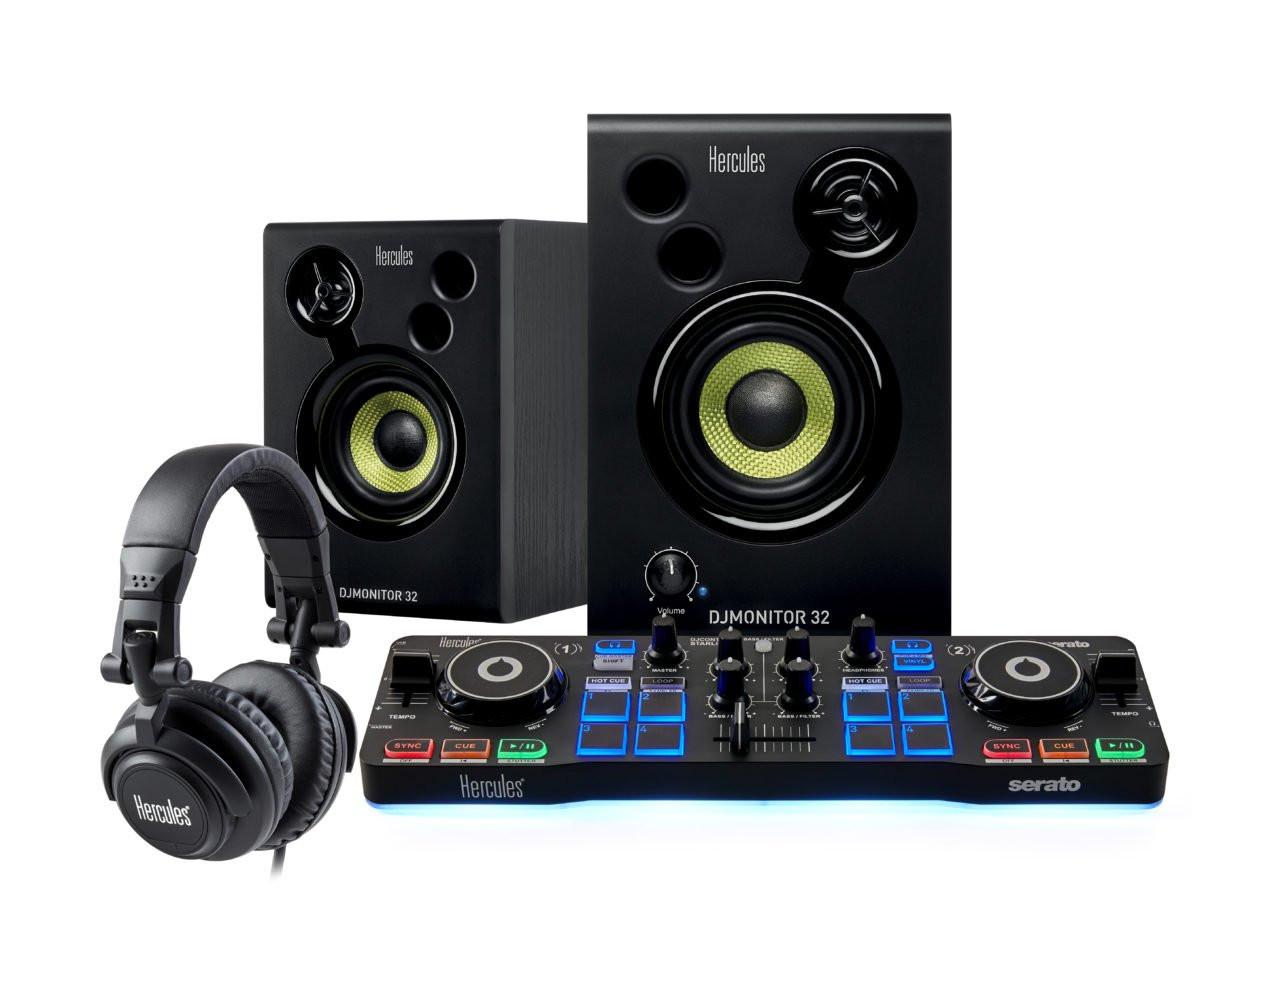 HERCULES DJ STARTER KIT KIT PER DJ CON CONTROLLER, MONITOR E CUFFIE